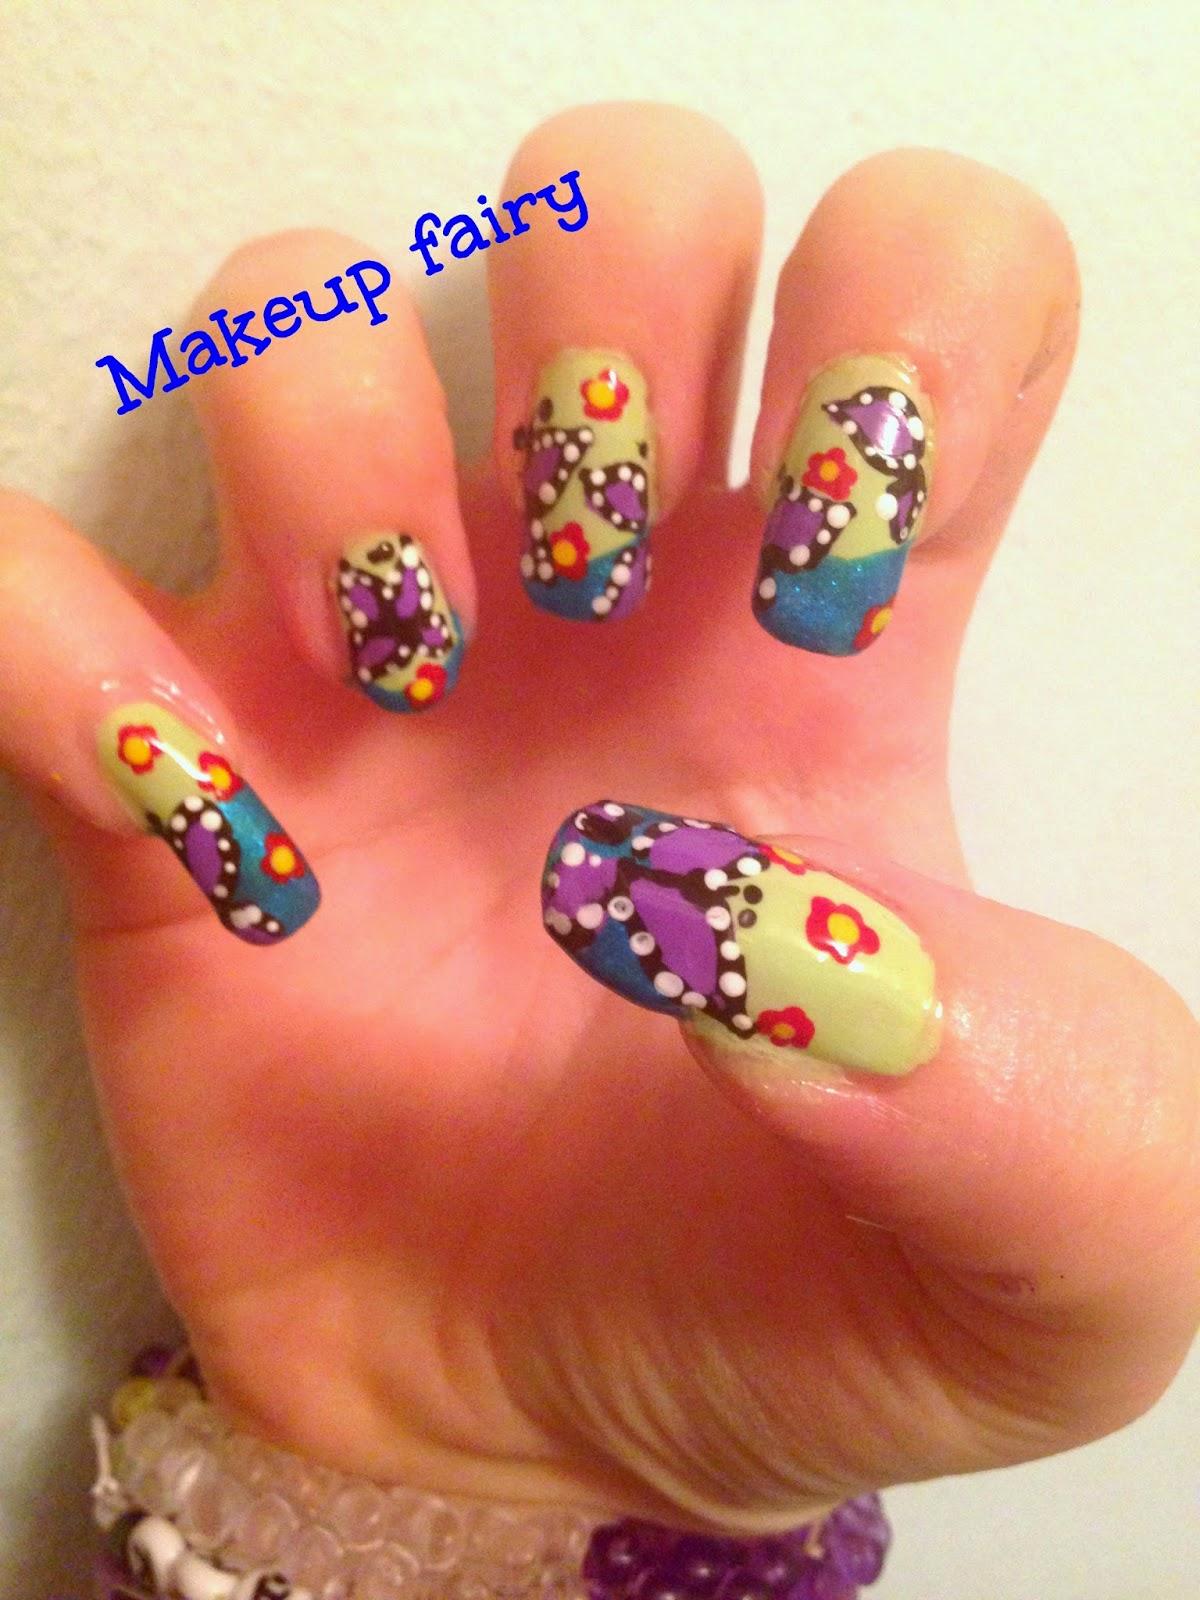 Tinklesmakeup: butterflies in a garden/farfalle nel giardino nail art